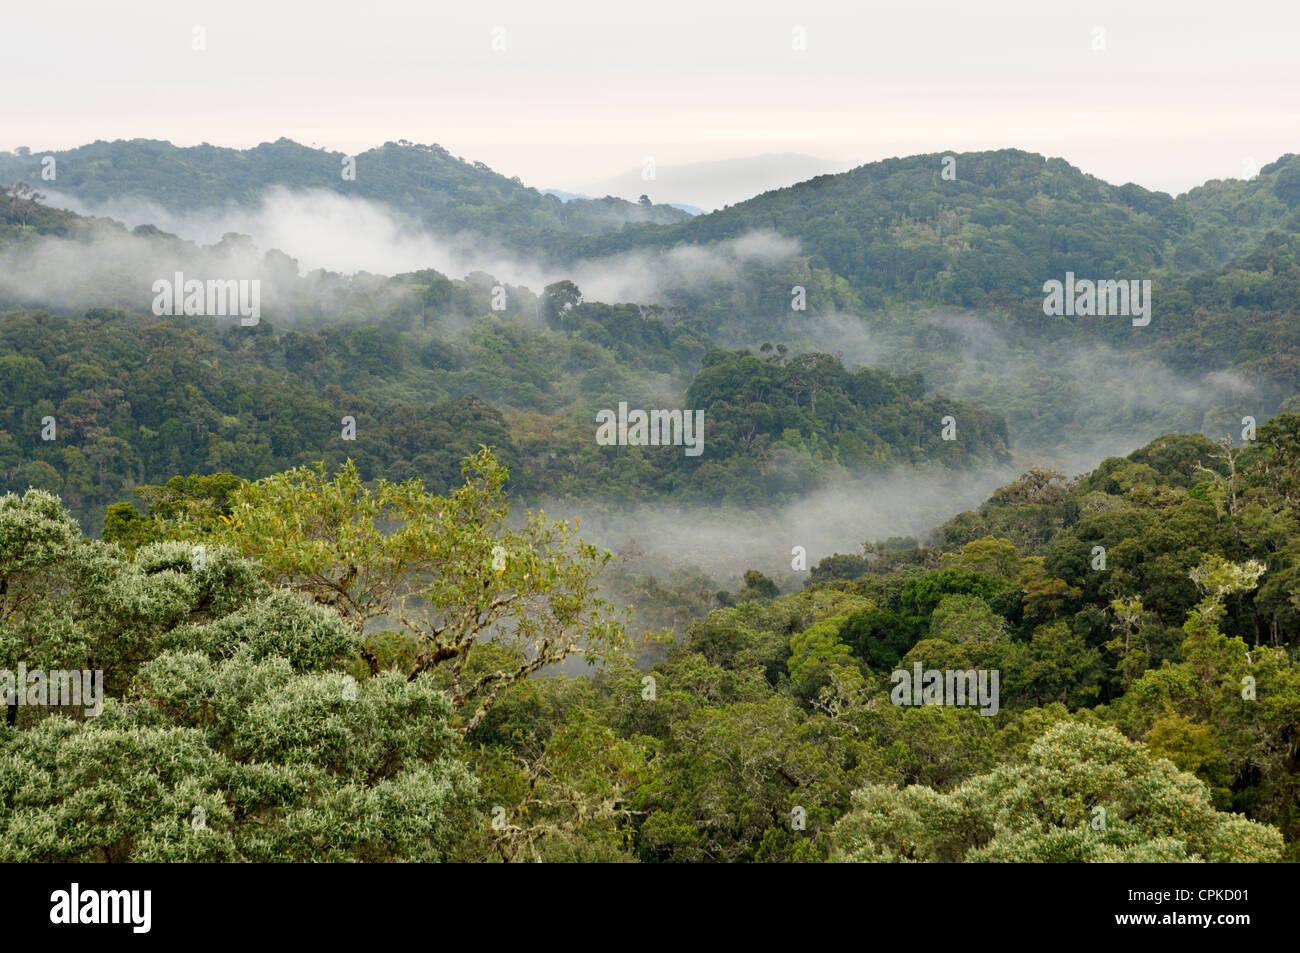 Tropischer Regenwald (nebelwald) auf 10.000 Fuß, Los Quetzales Nationalpark, Cerro de La Muerte, Costa Rica Stockbild